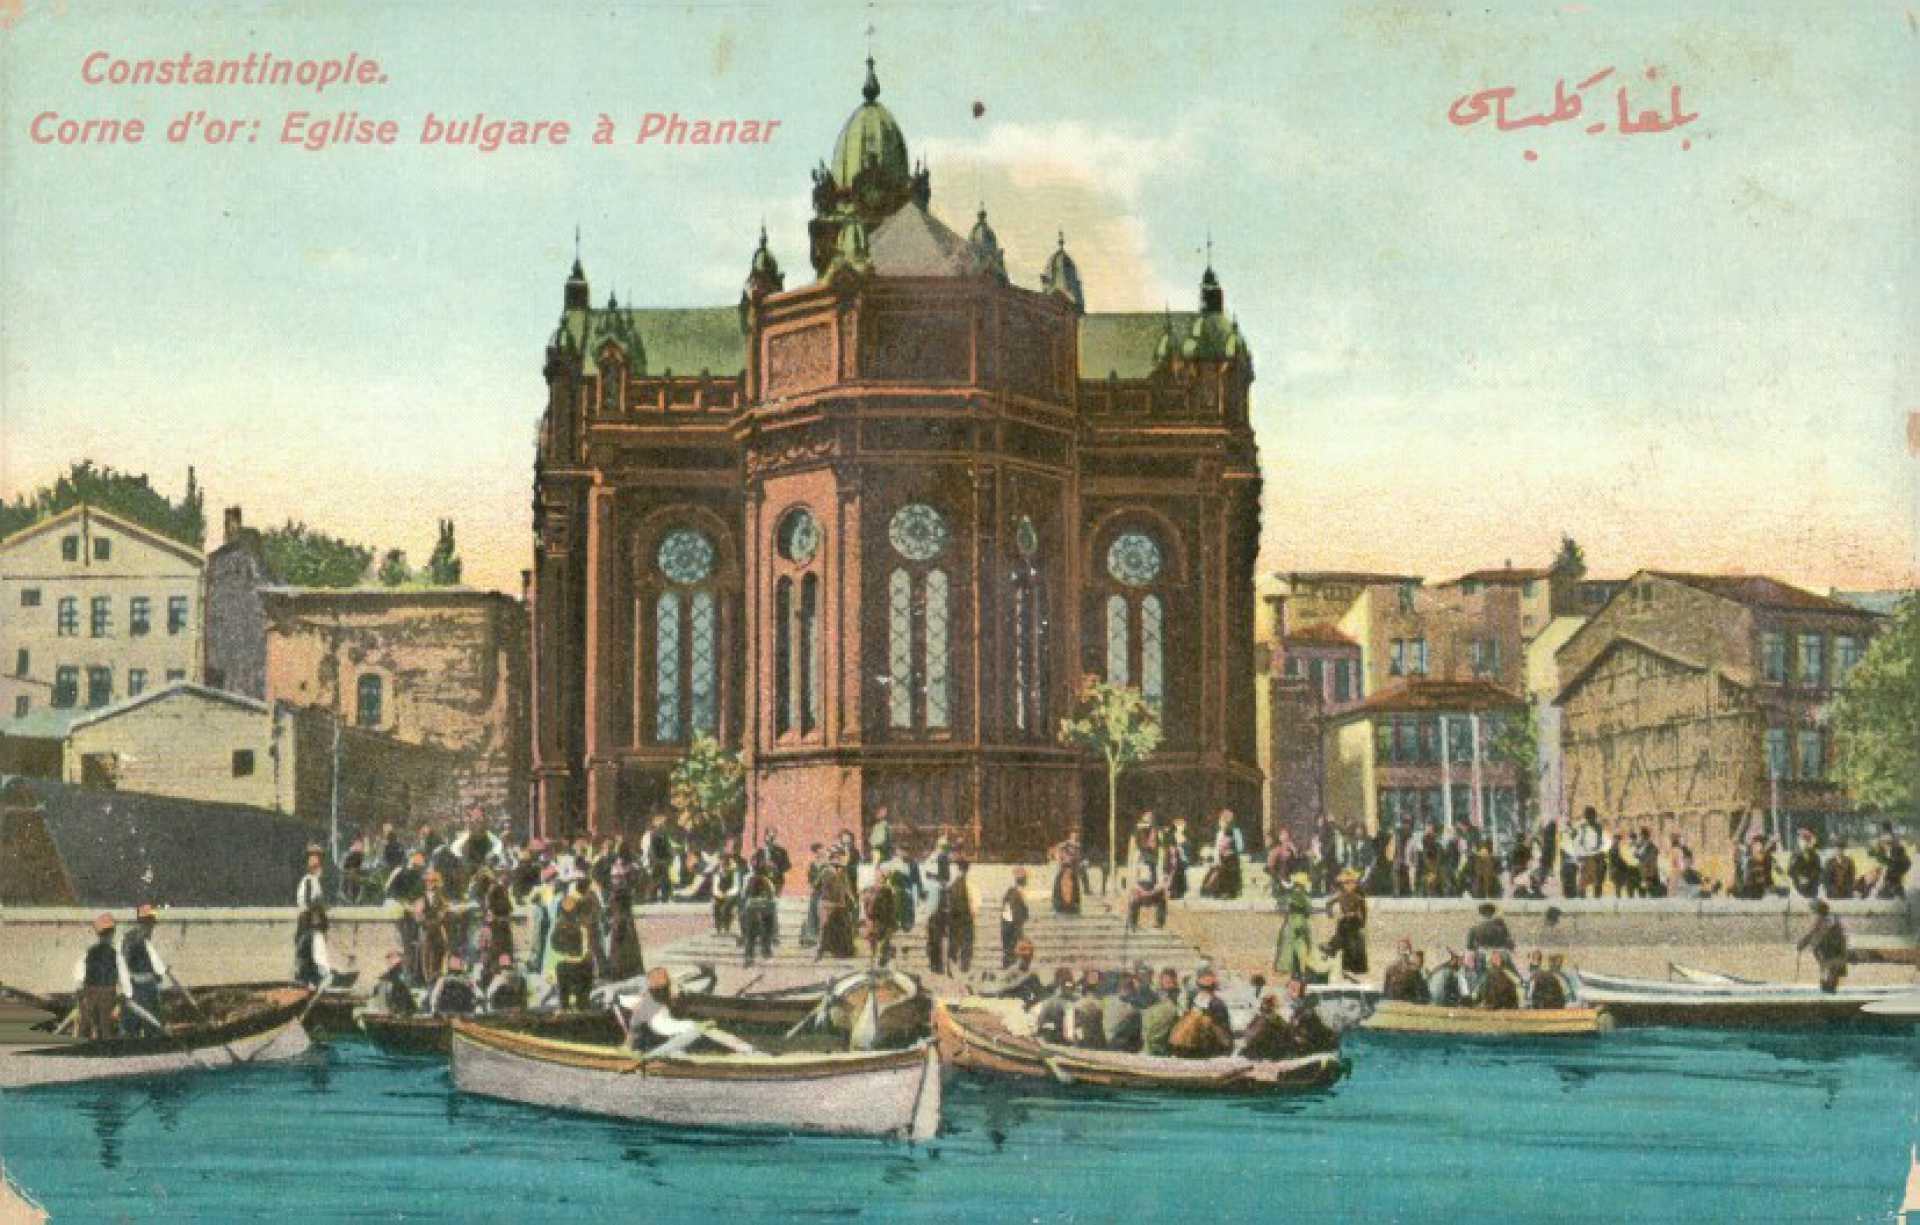 Corne d'Or: Eglise bulgare a Phanar